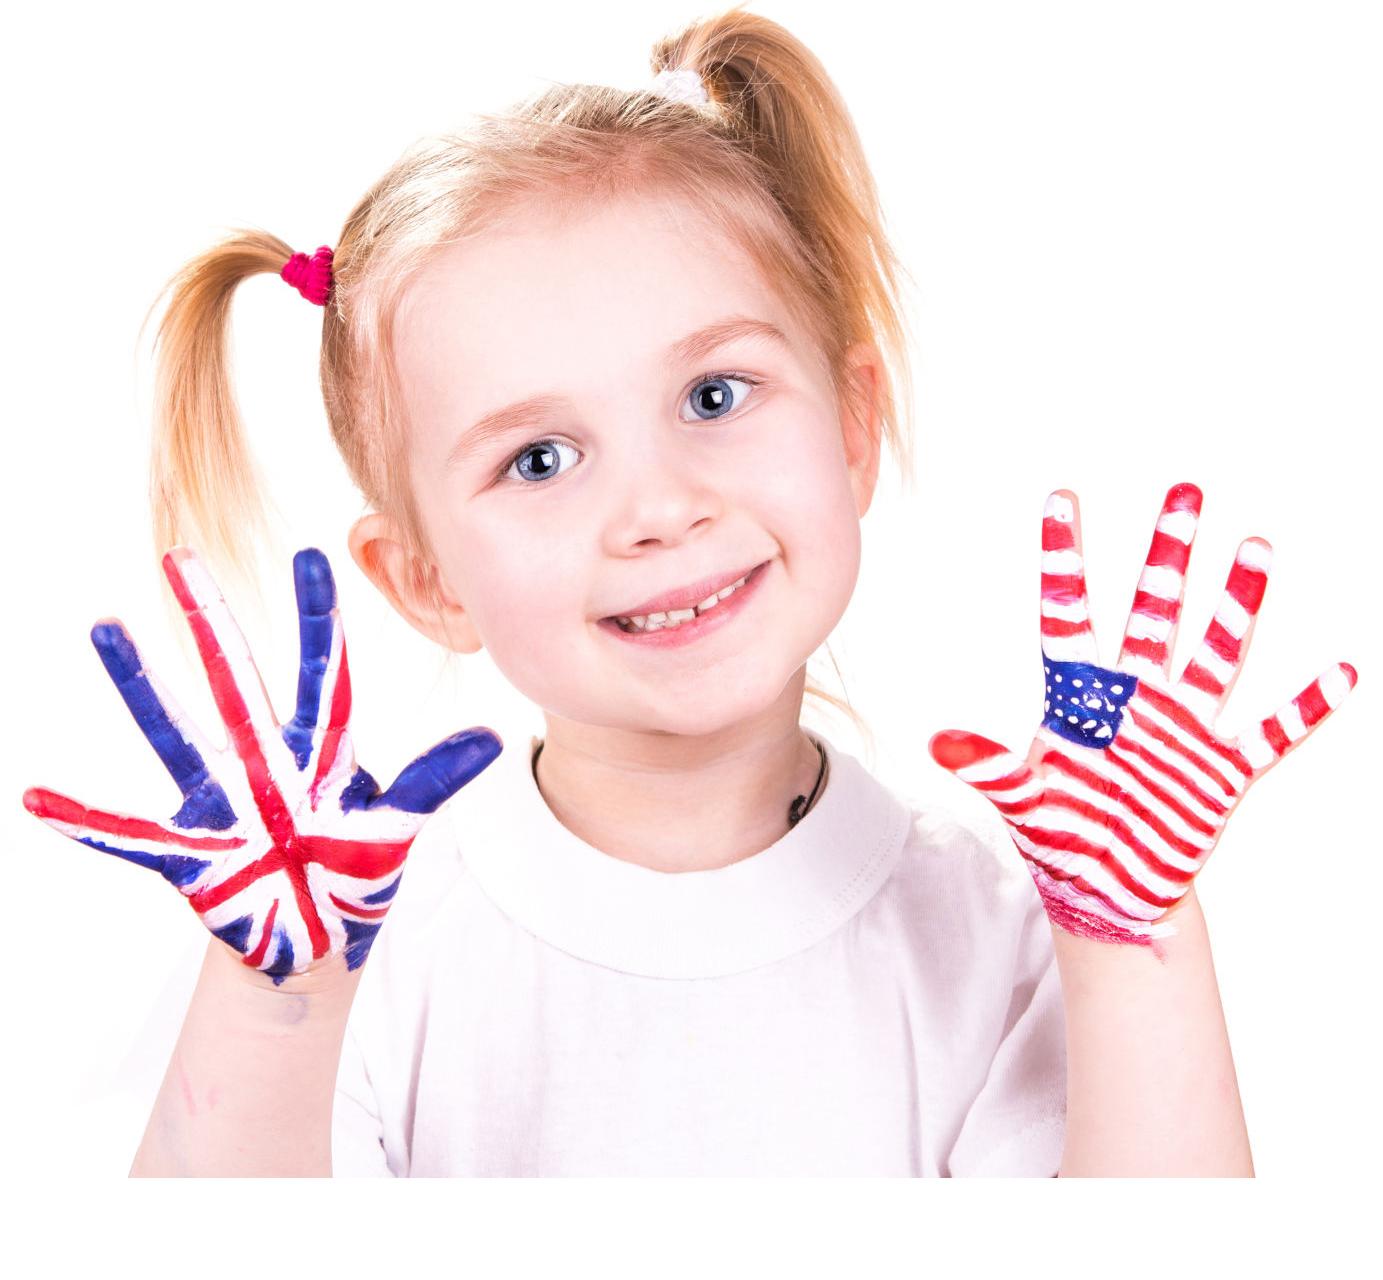 Clases de inglés para niños de infantil